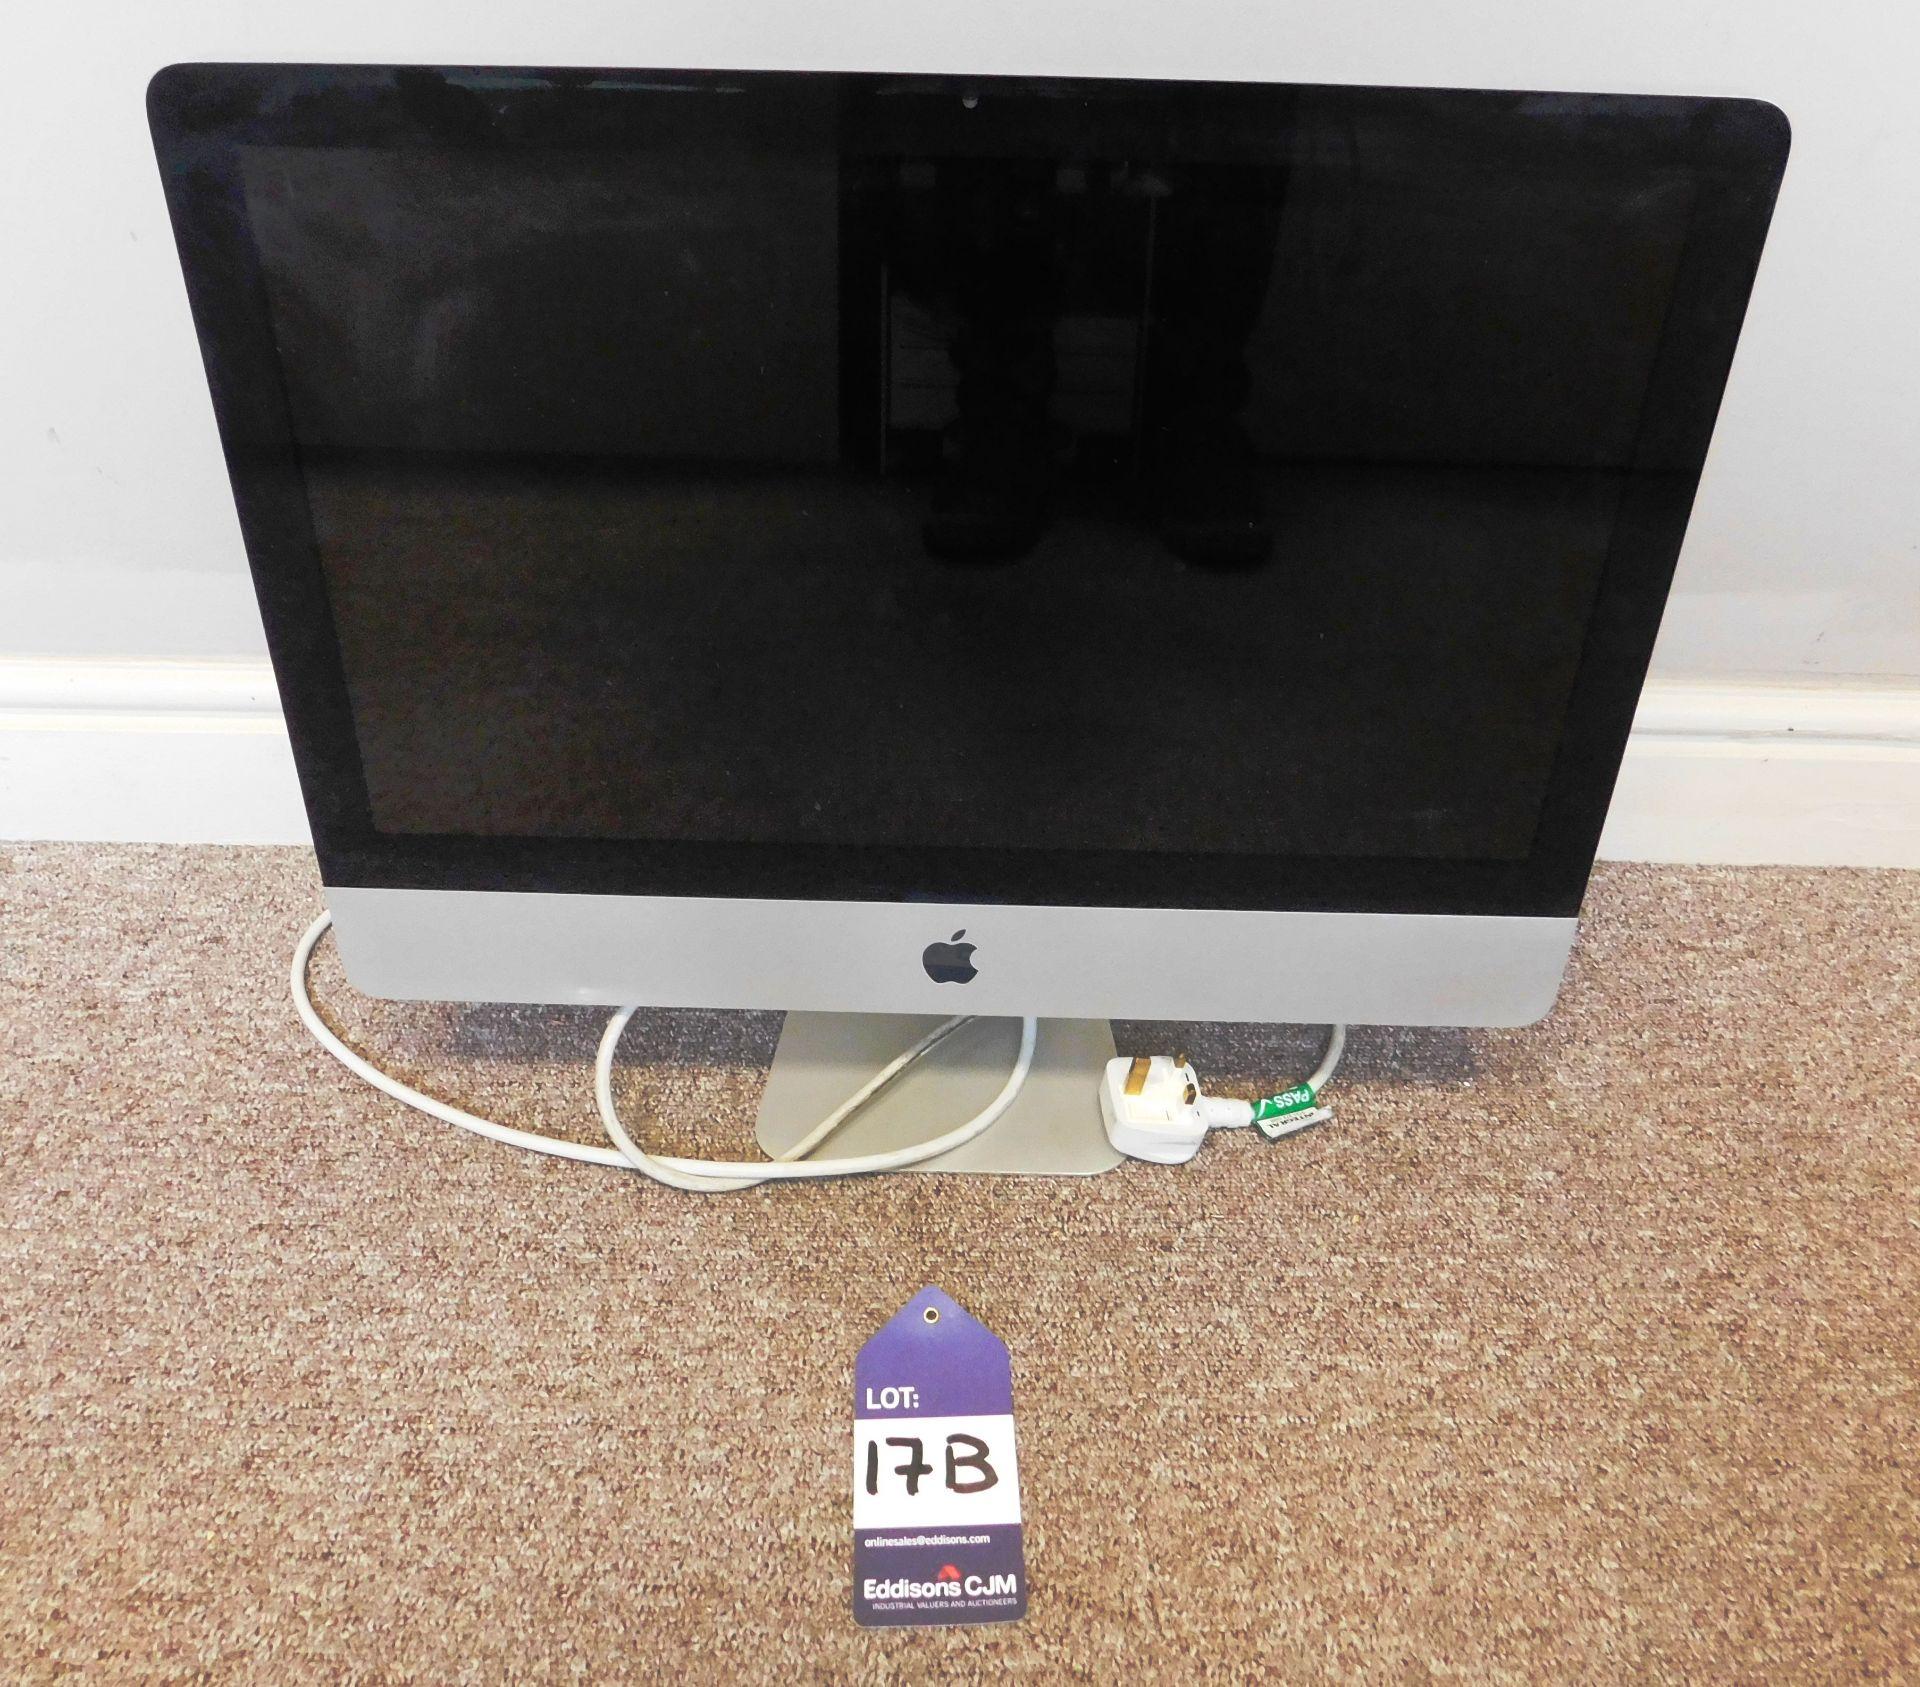 Apple 21.5 inch iMac, 2010, A1311 Desktop Computer